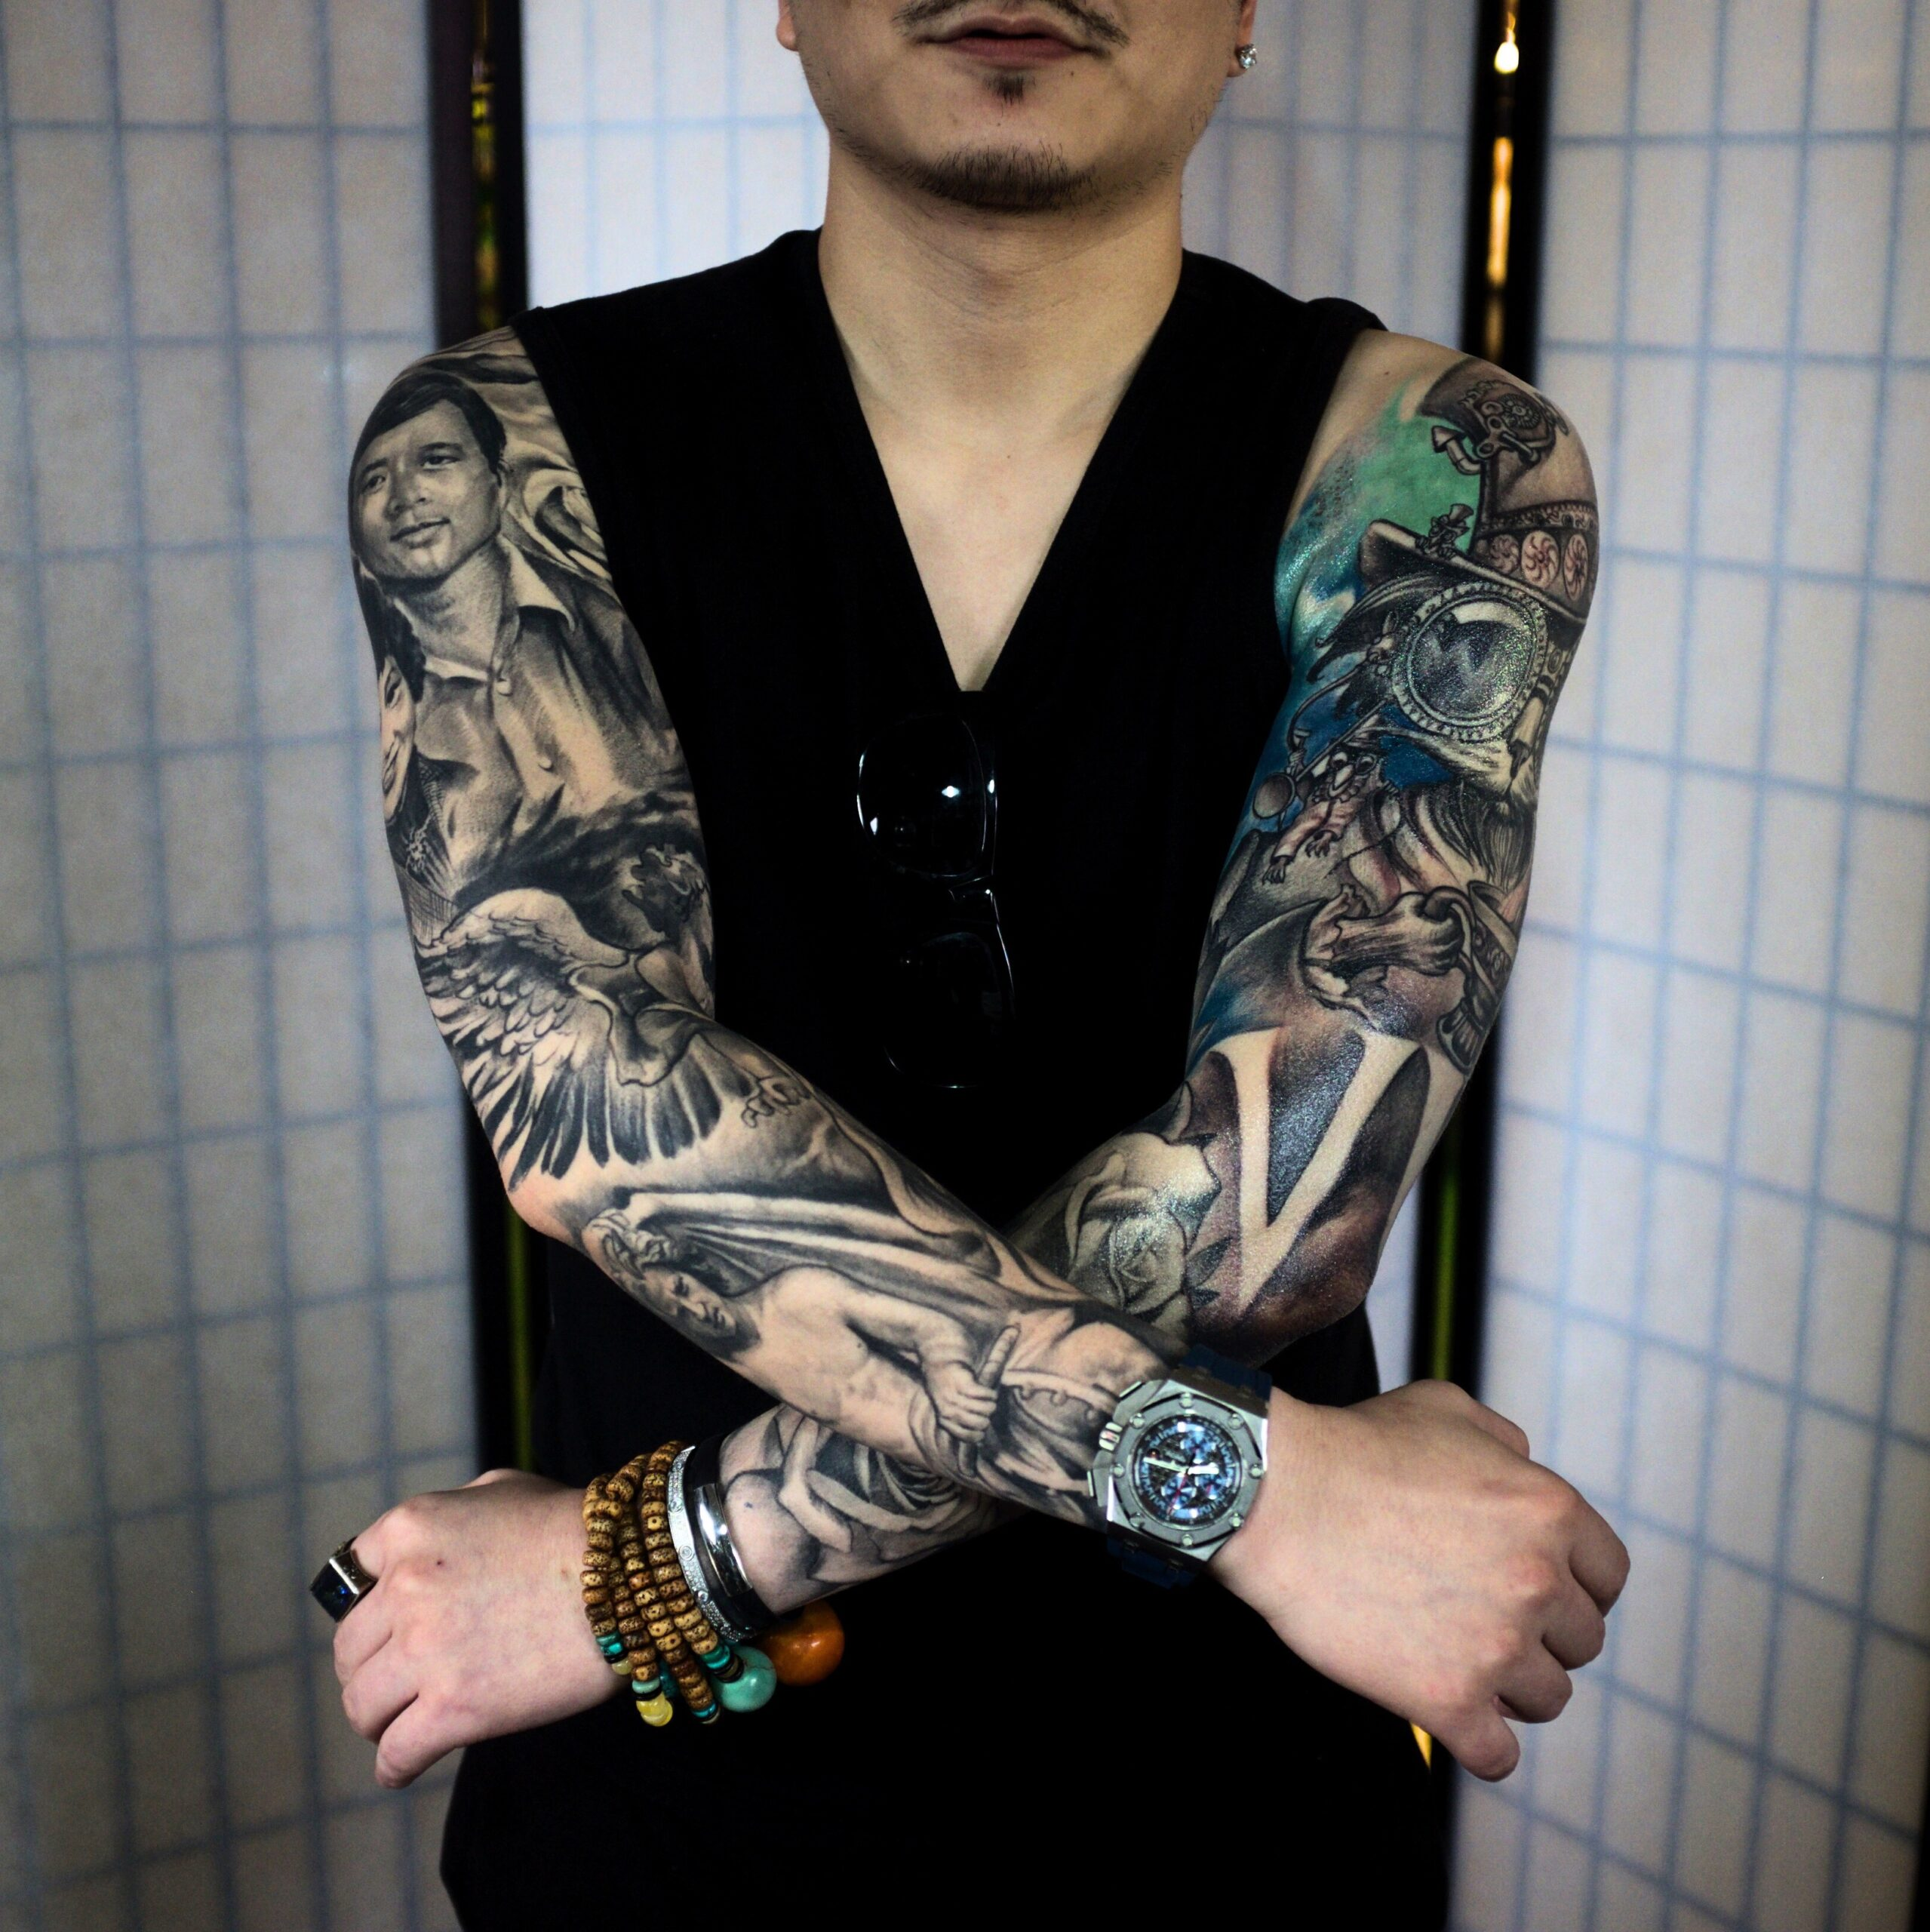 zhuo dan ting tattoo work 卓丹婷纹身作品 双花臂酷纹身 1